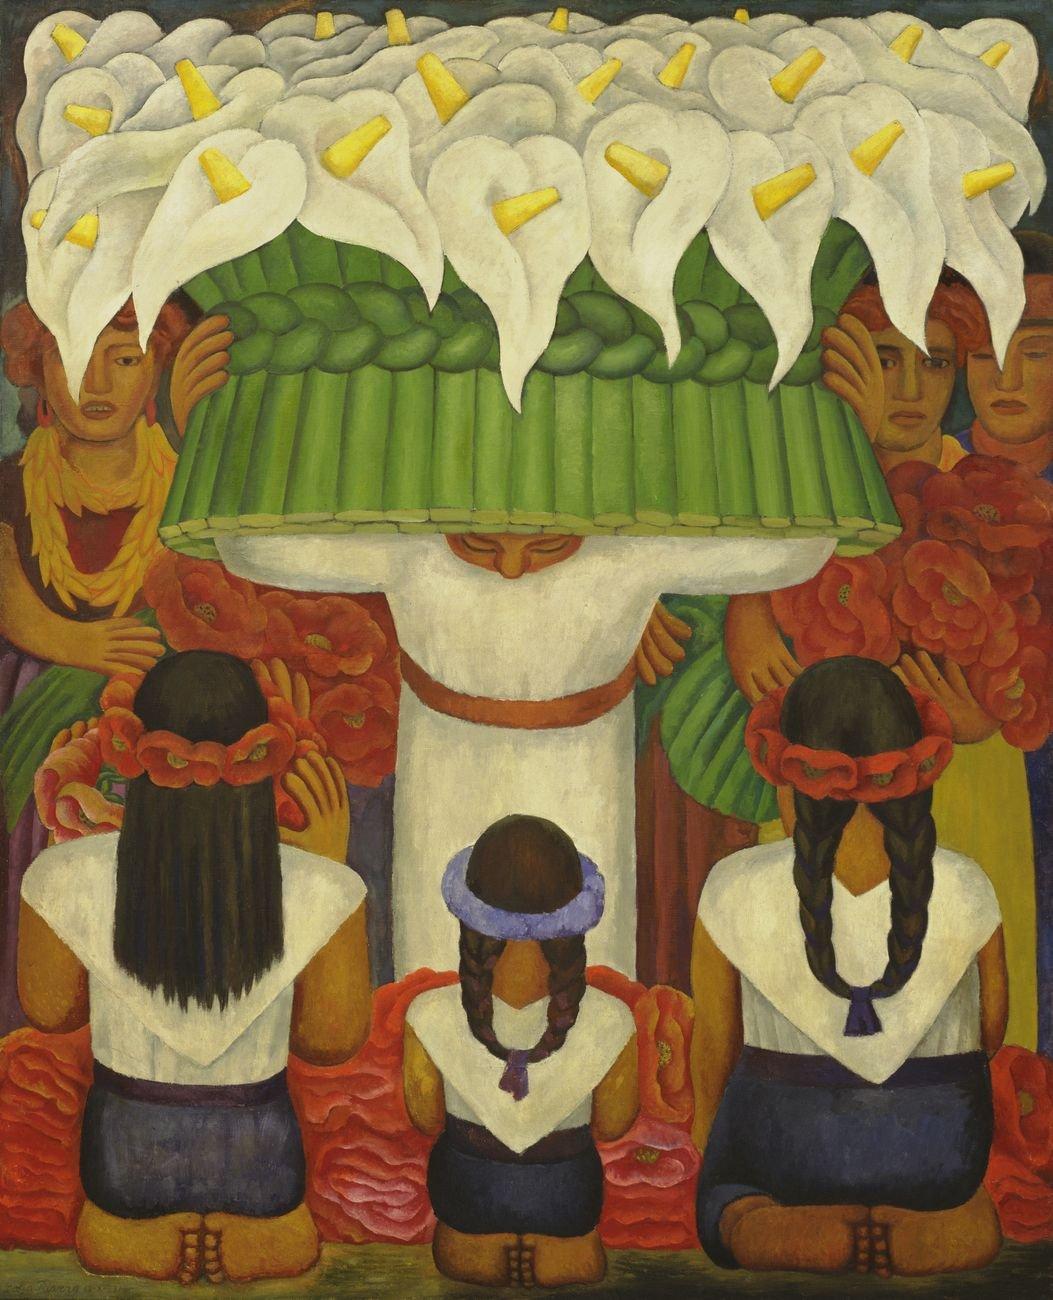 Diego Rivera, Flower Festival. Feast of Santa Anita, 1931. MoMA, New York © 2020 Banco de México Diego Rivera Frida Kahlo Museums Trust, Mexico, D.F. - Artists Rights Society (ARS), New York. Photo © MoMA - Licensed by SCALA - Art Resource, New York